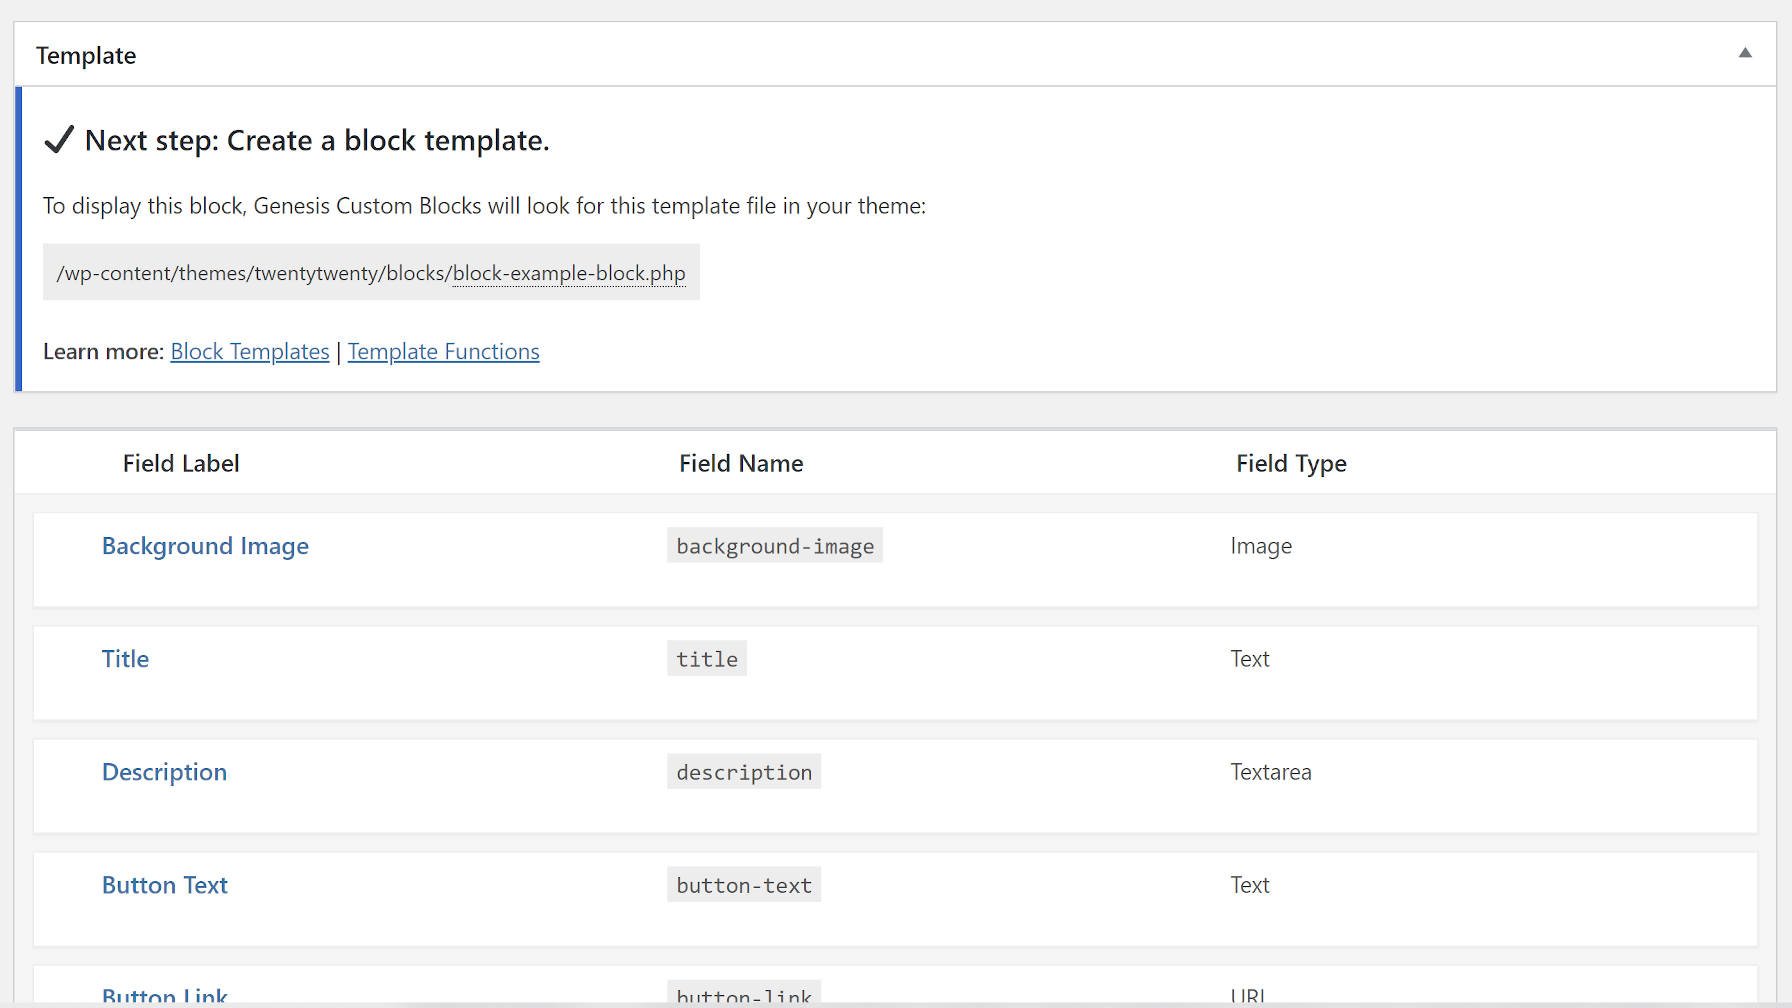 Build Editor Blocks for Clients With the Genesis Custom Blocks Plugin